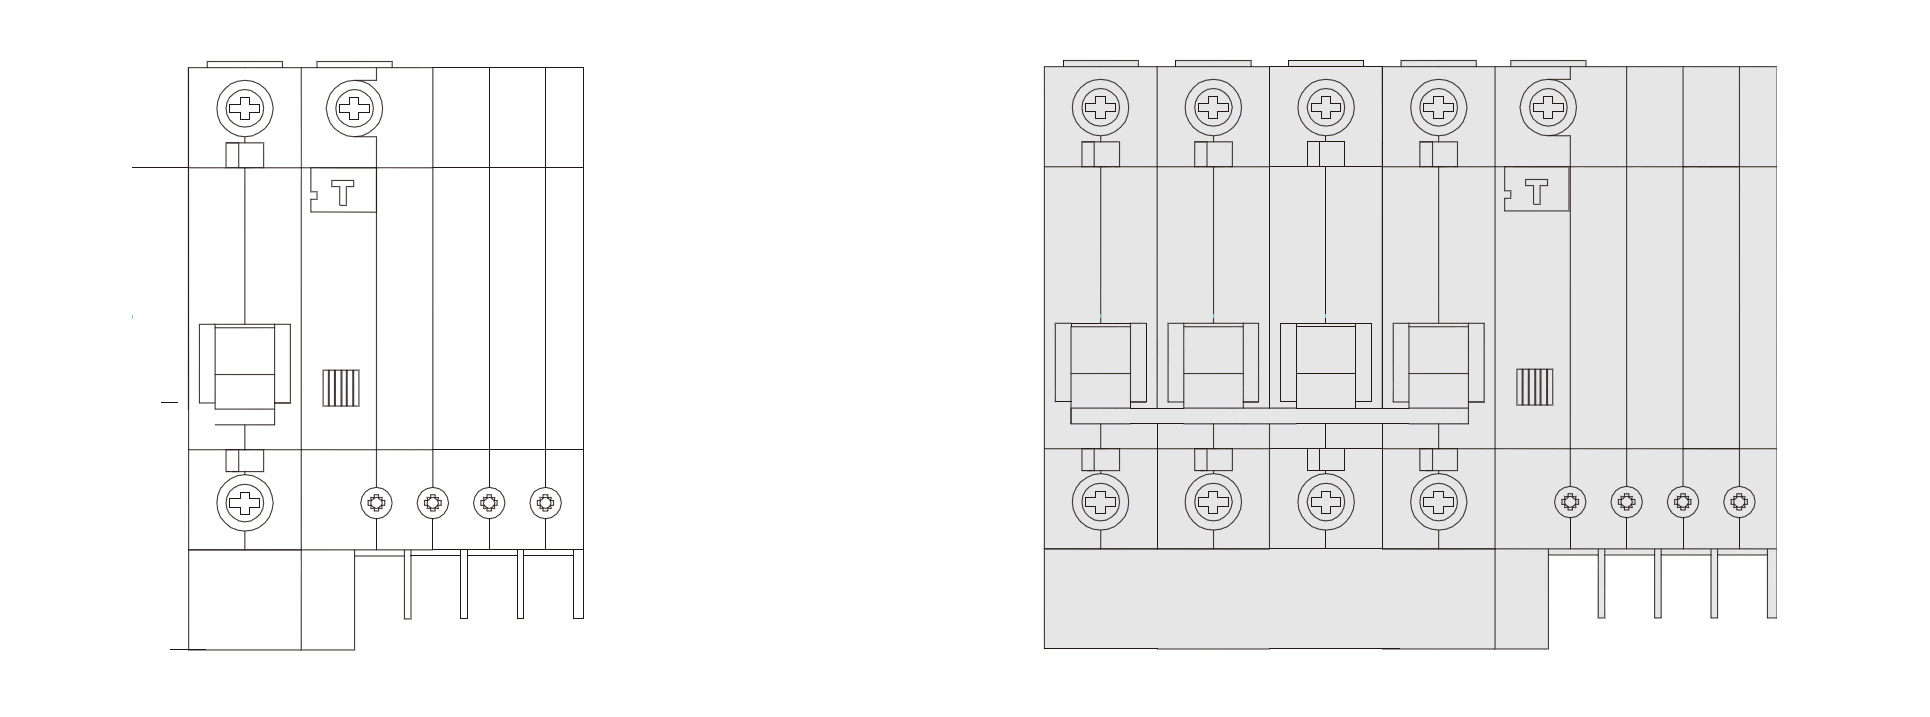 Dz47le 63 elcb breaker taixi electric wiring diagram keywords dz47le 32 elcb breaker swarovskicordoba Gallery